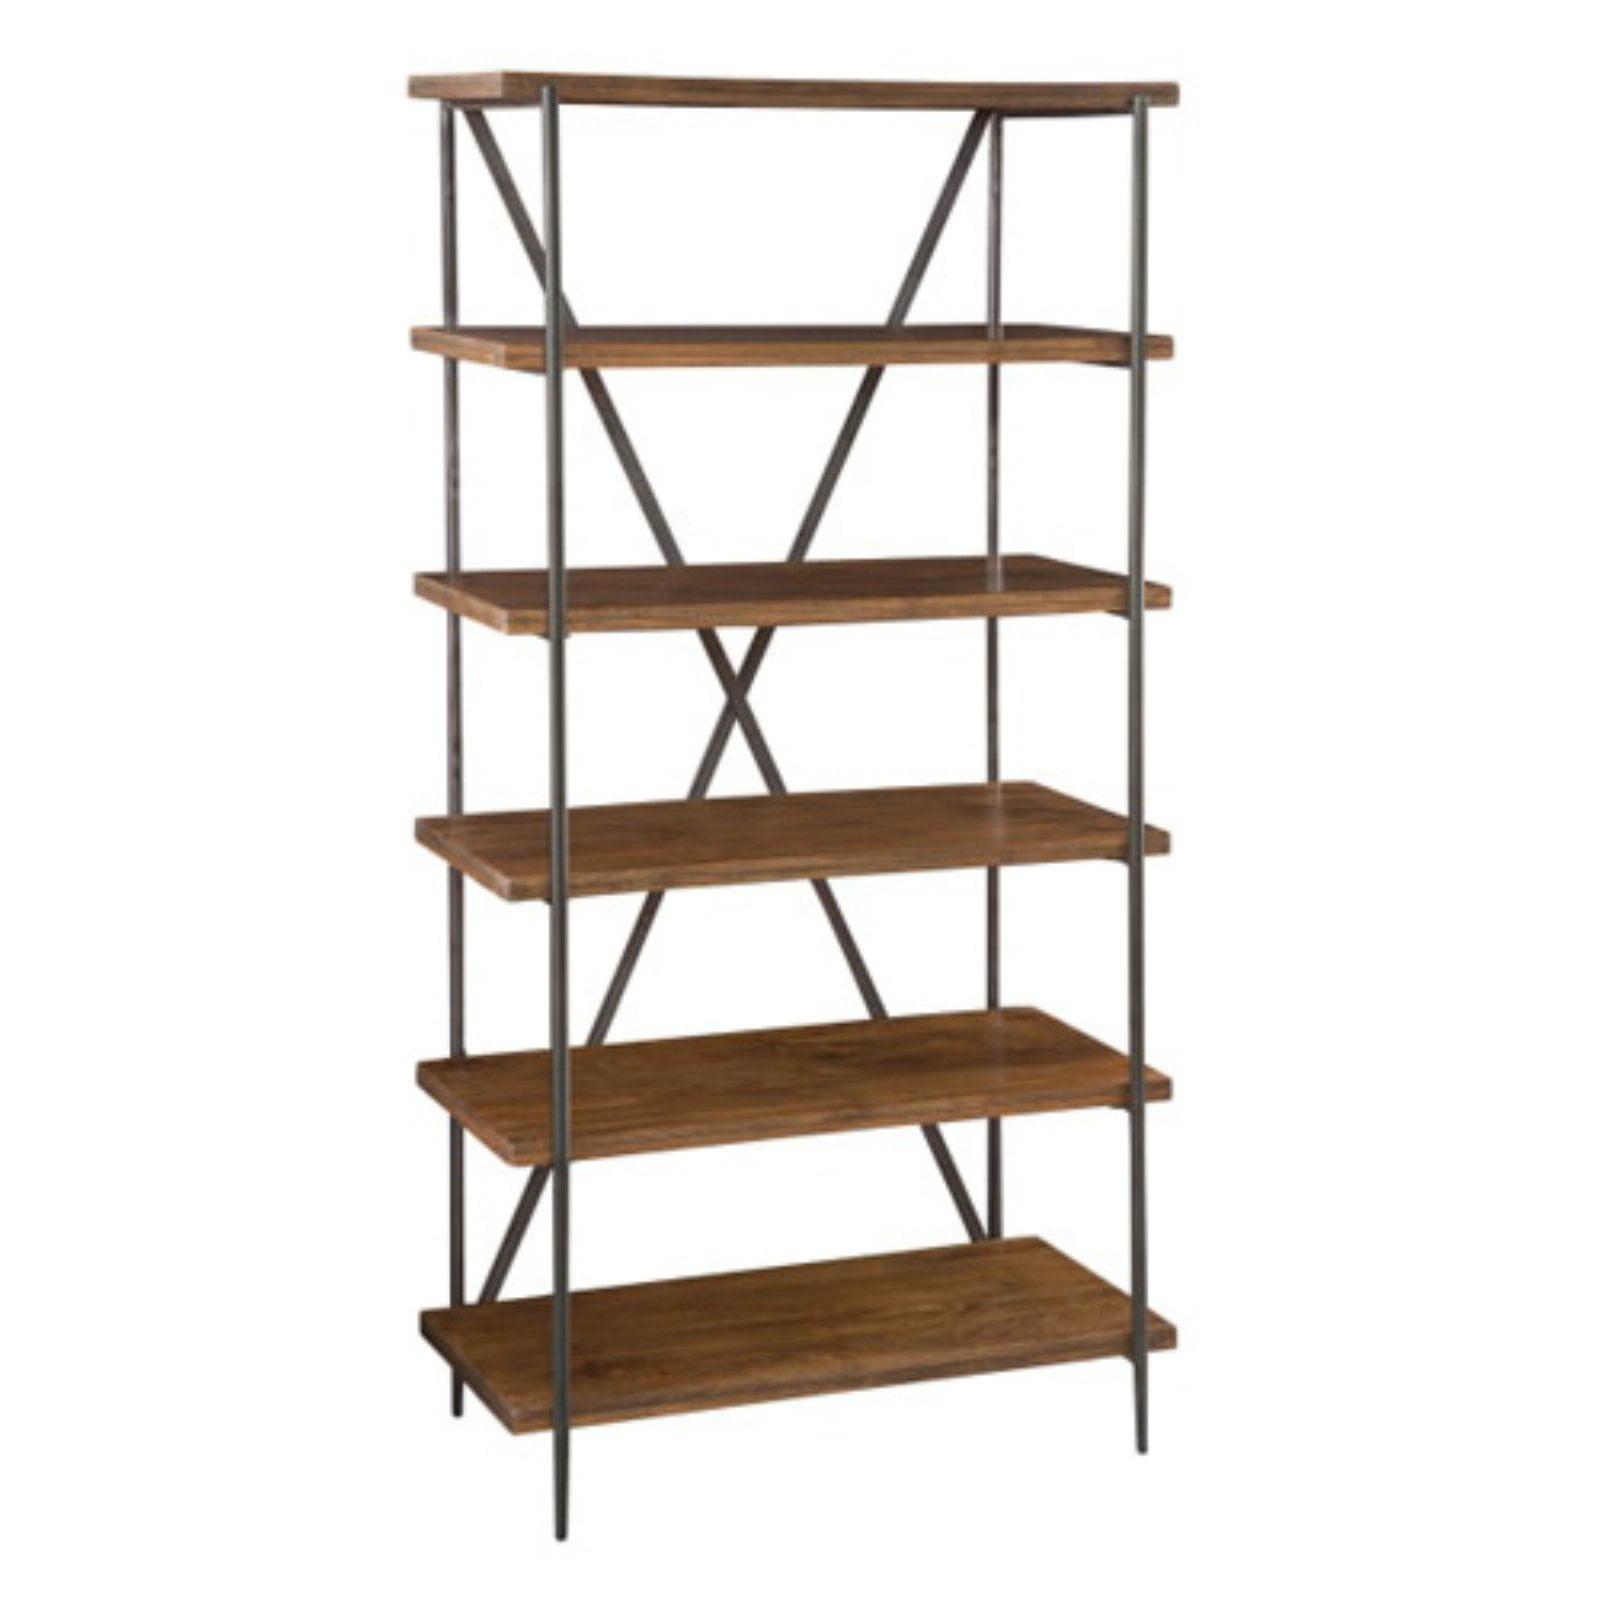 Hekman Bedford Park Etagere Bookcase by Hekman